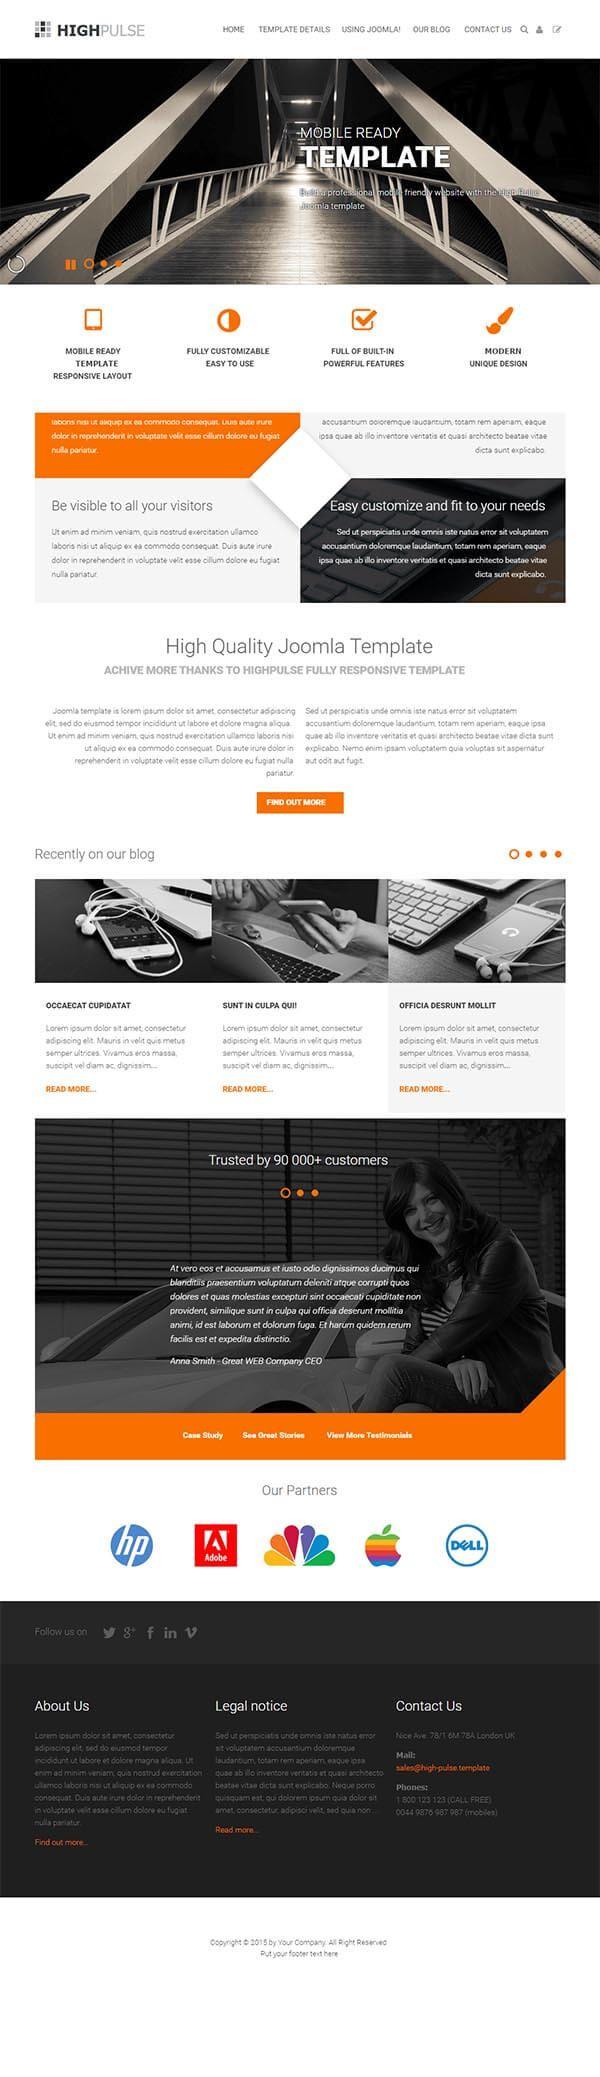 58 best Joomla Templates images on Pinterest   Joomla templates, E ...